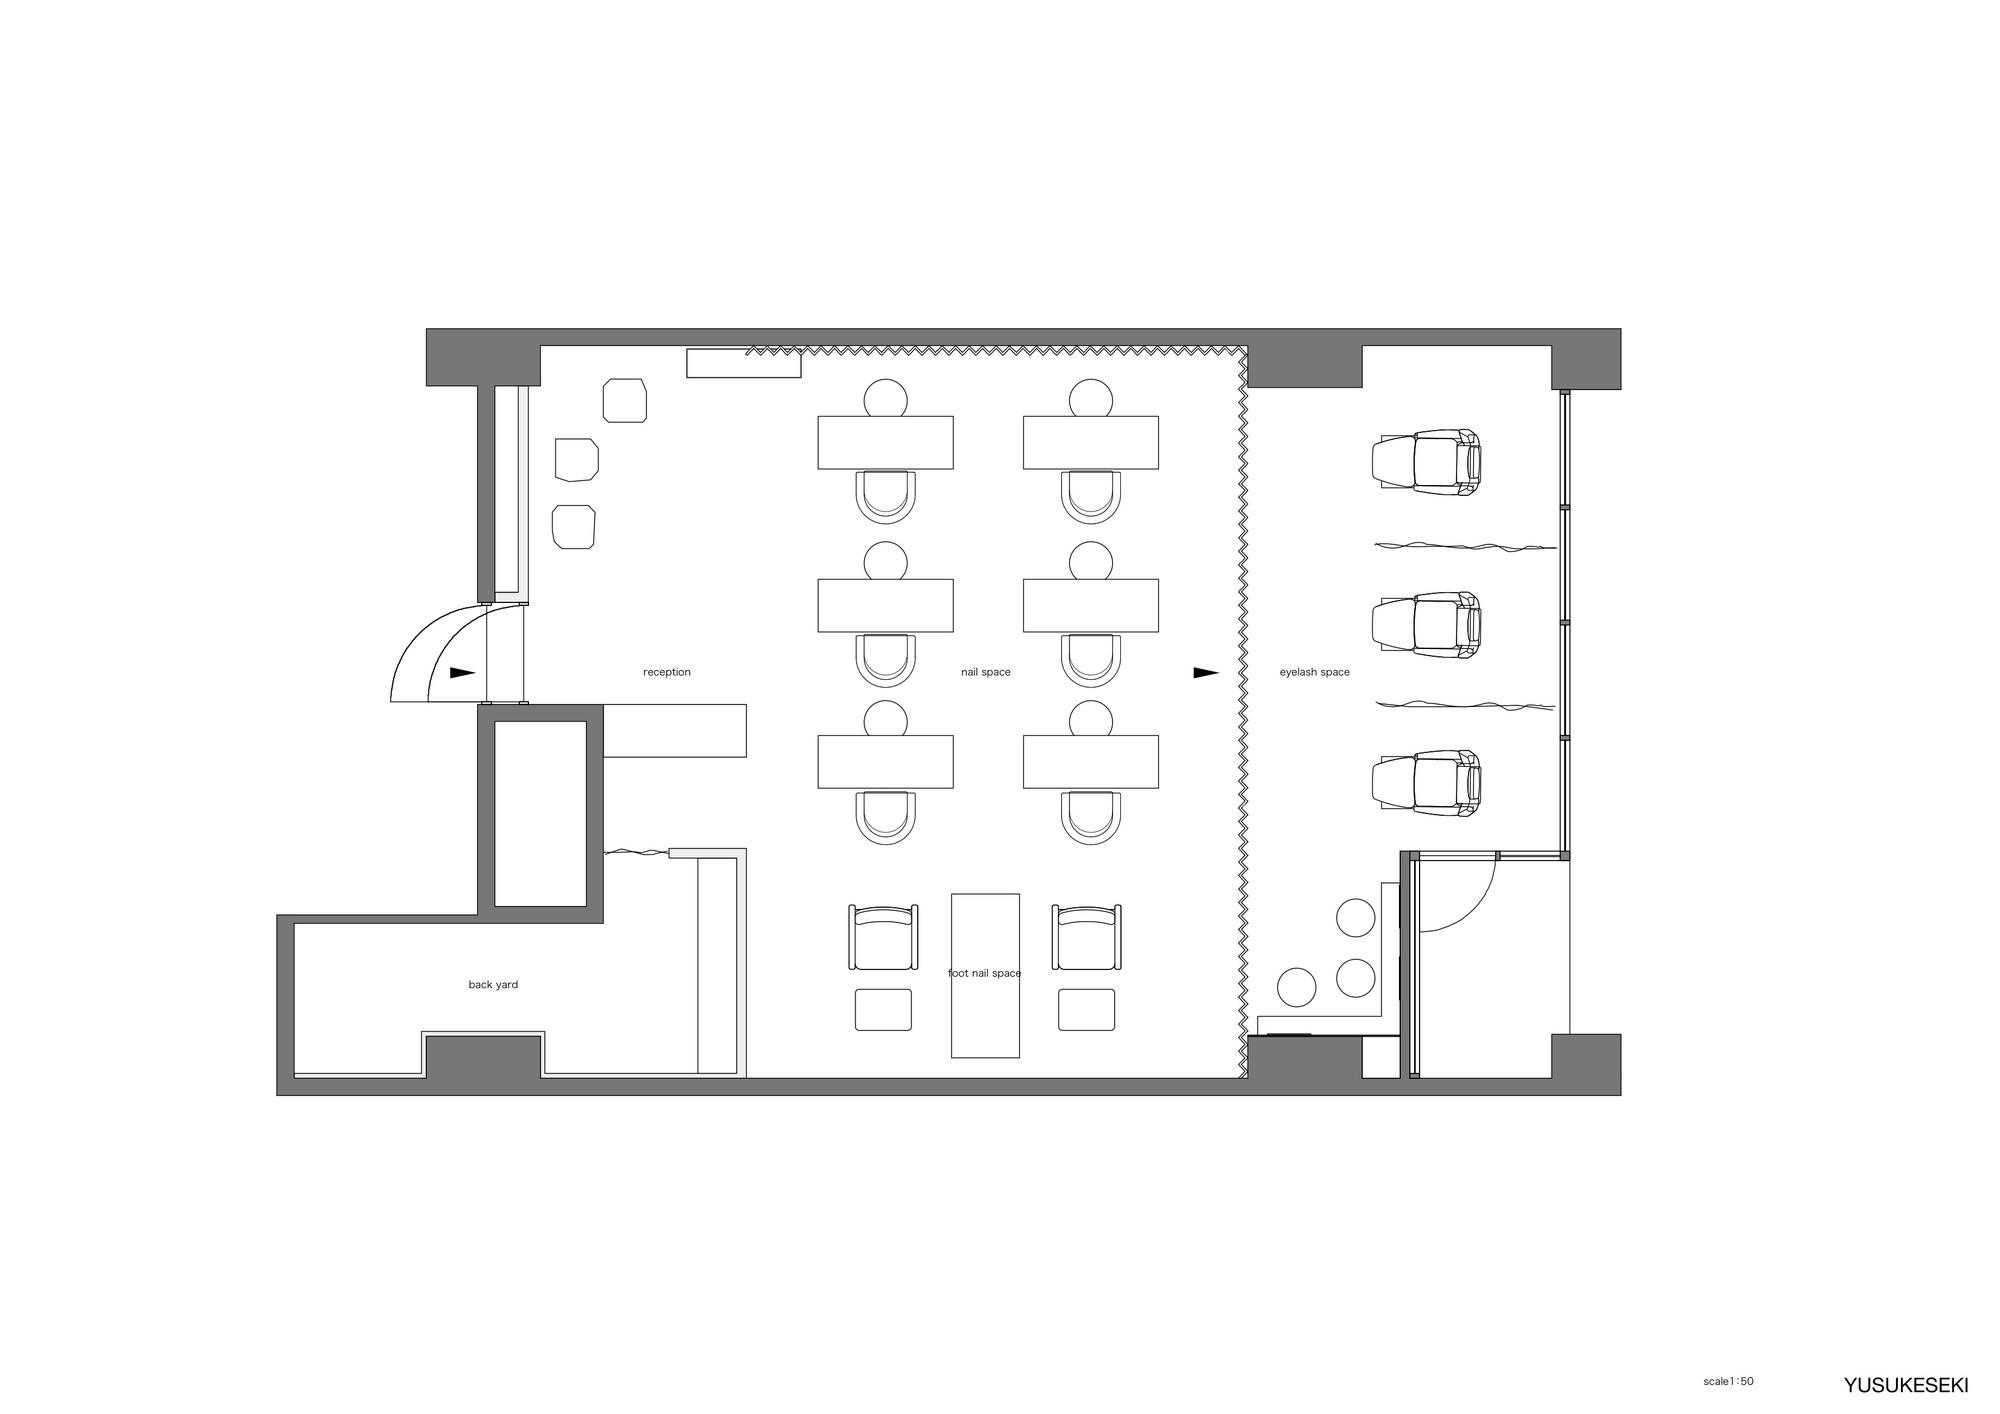 Nail Salon Floor Plan: Kolmio+LIM / Yusuke Seki